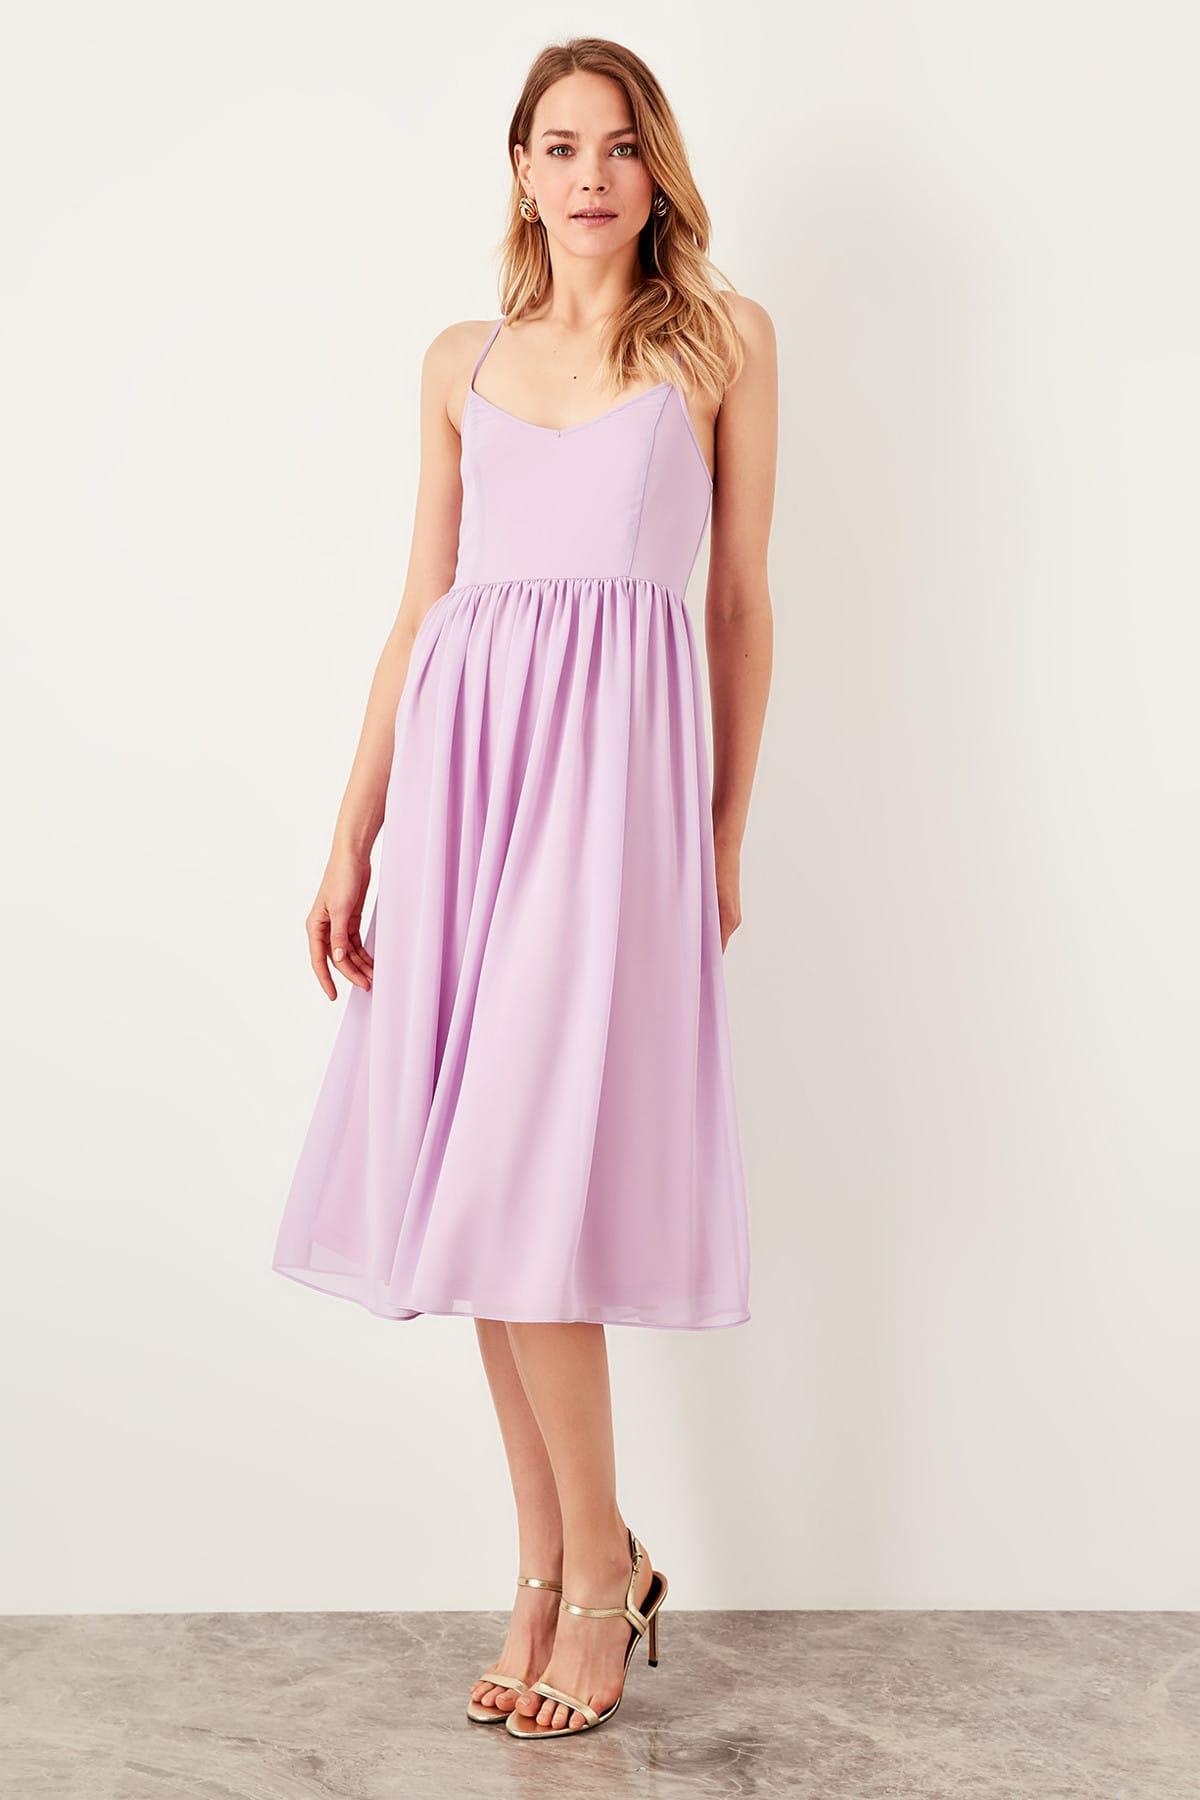 My favorite style dress a short sleeve midi wrap dress